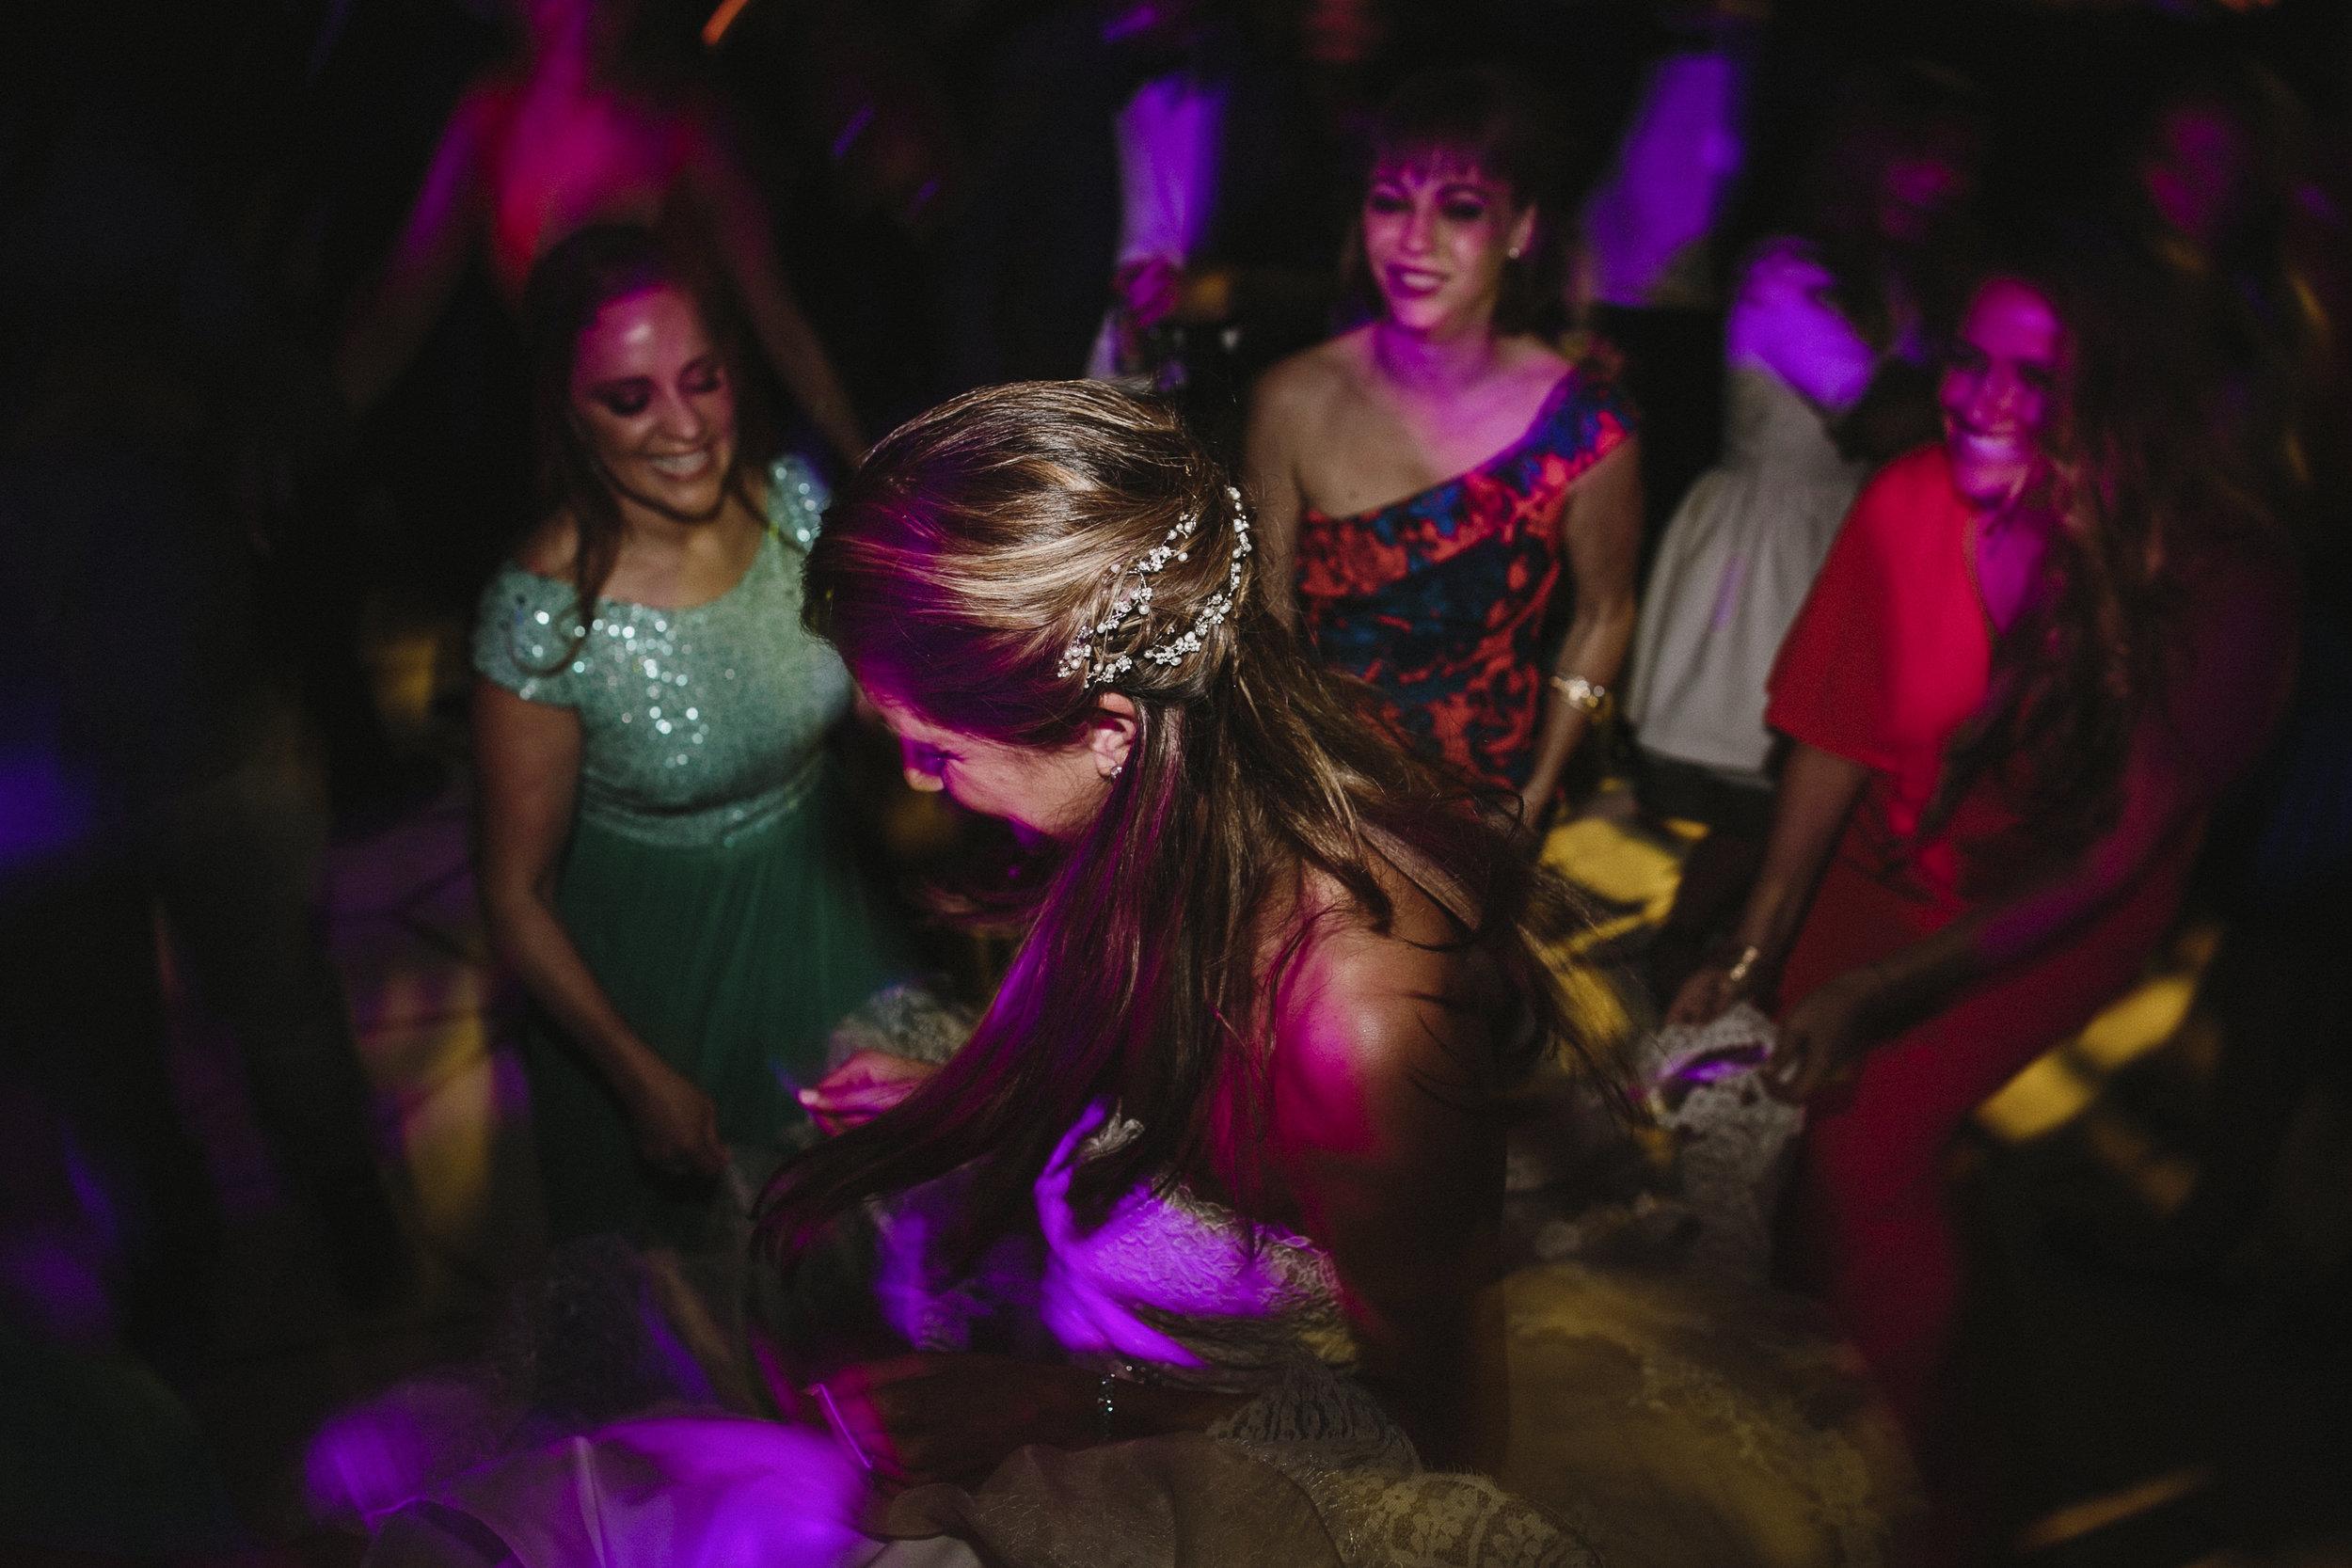 alfonso_flores_destination_wedding_photogrpahy_paola_alonso-1361.JPG